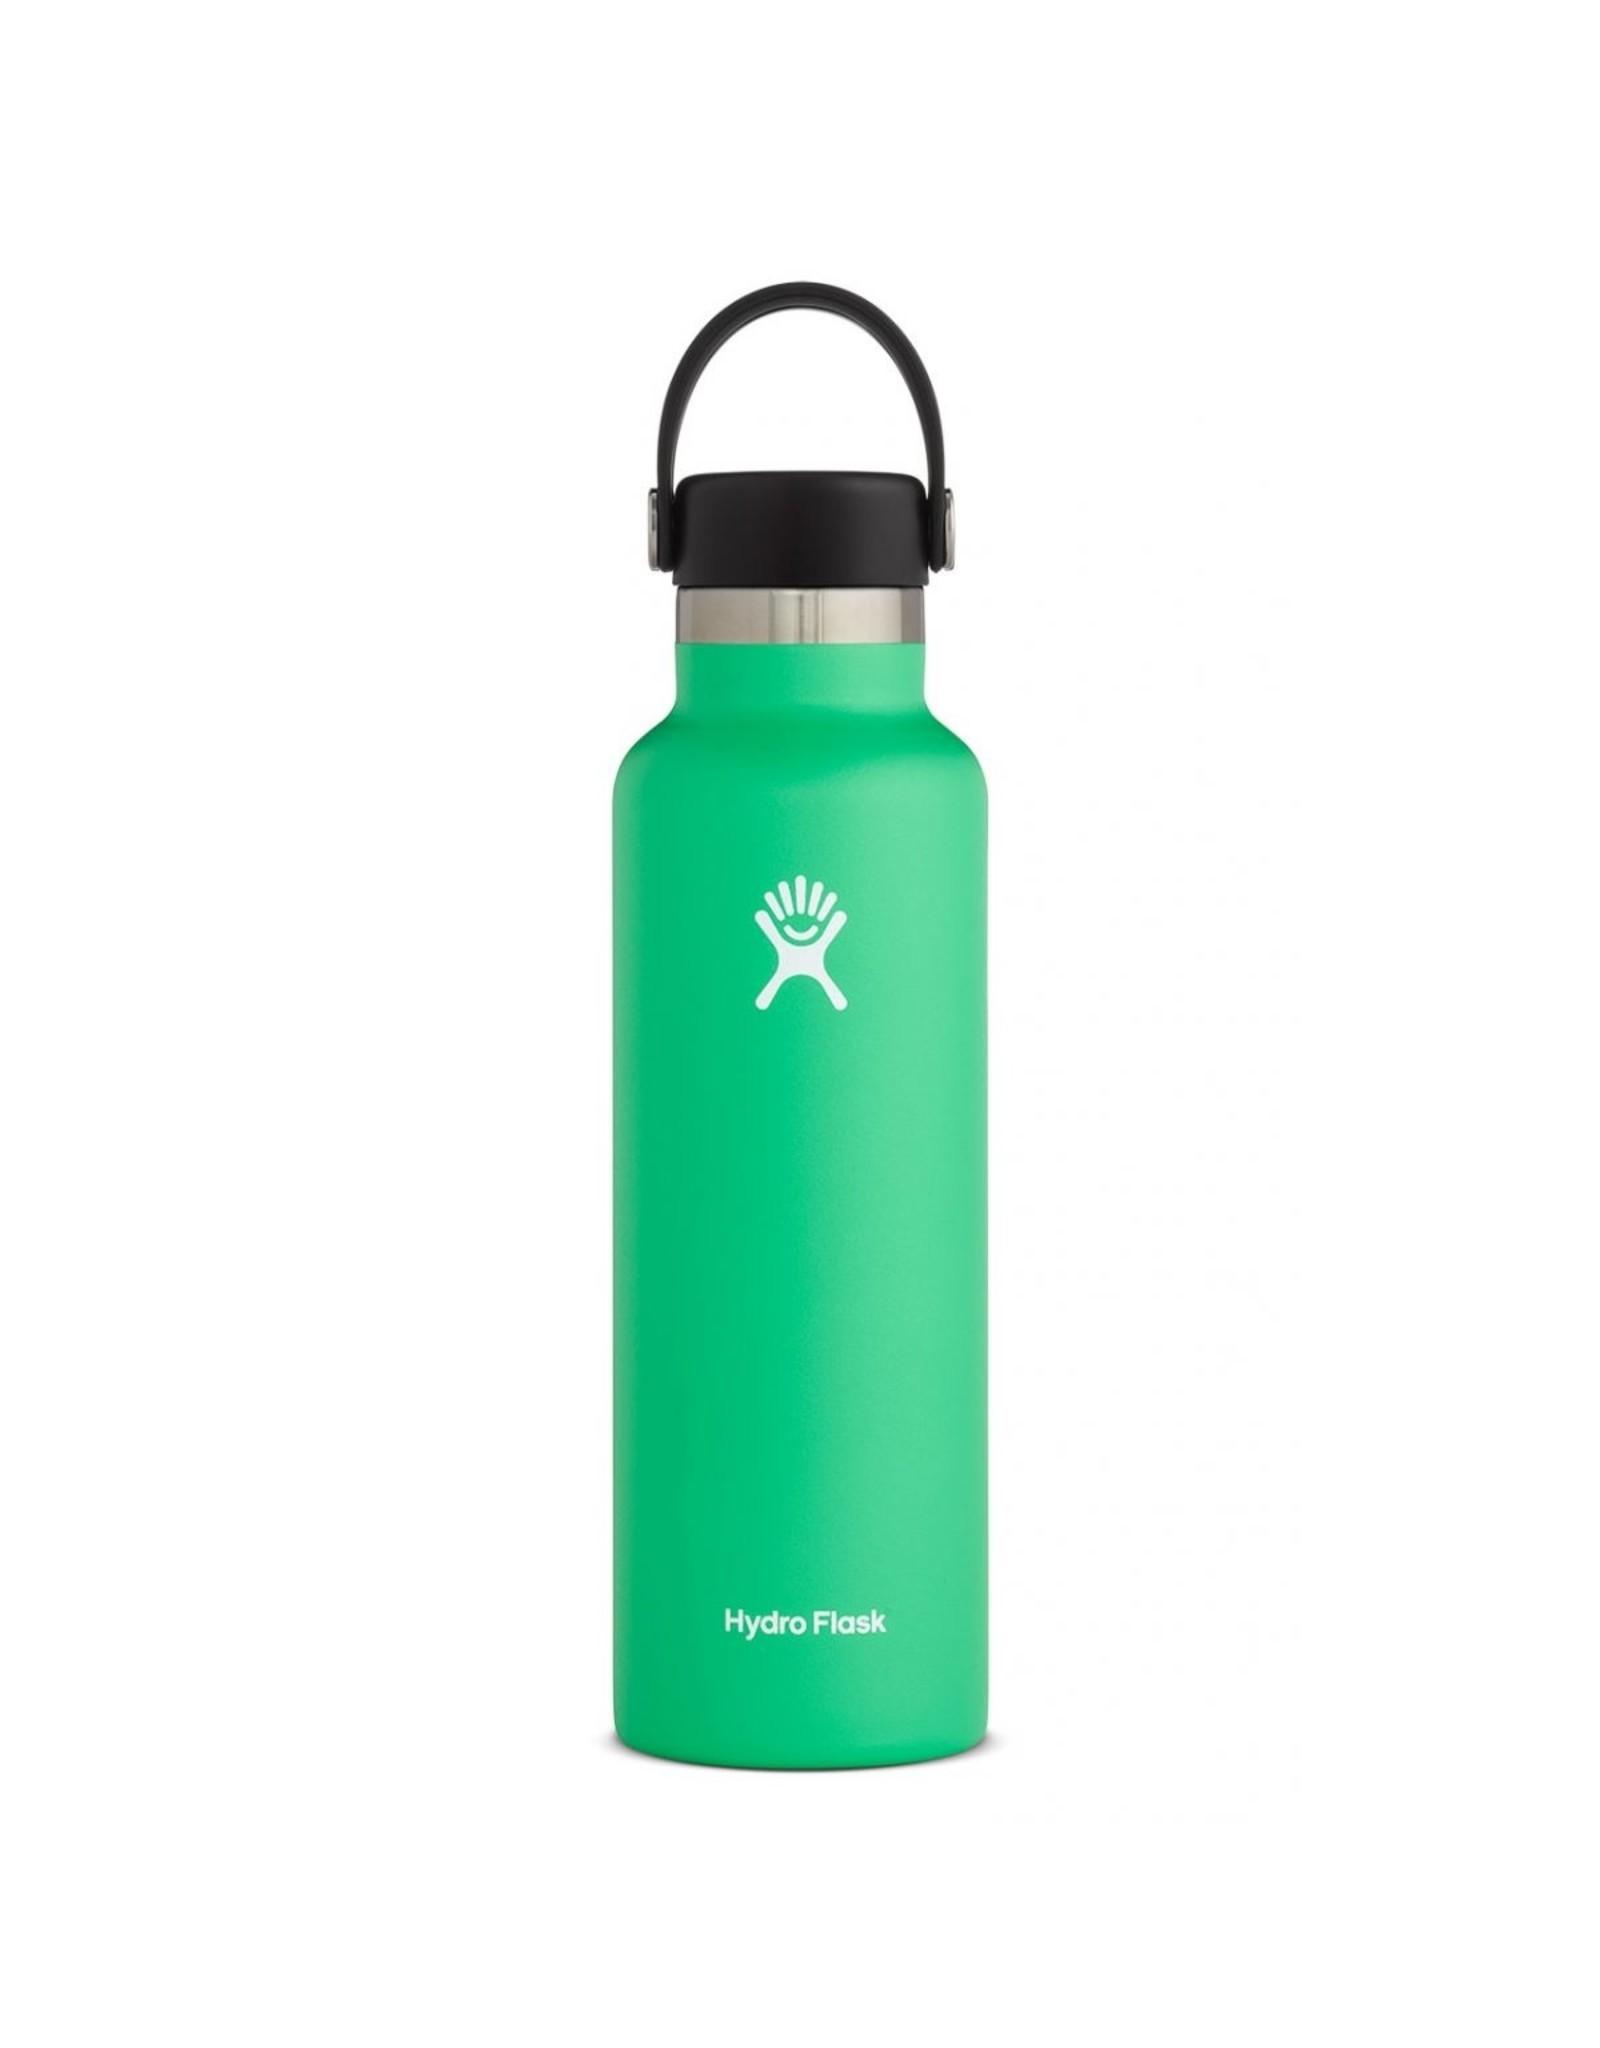 Hydro Flask Hydro Flask 21oz Standard Mouth Spearmint